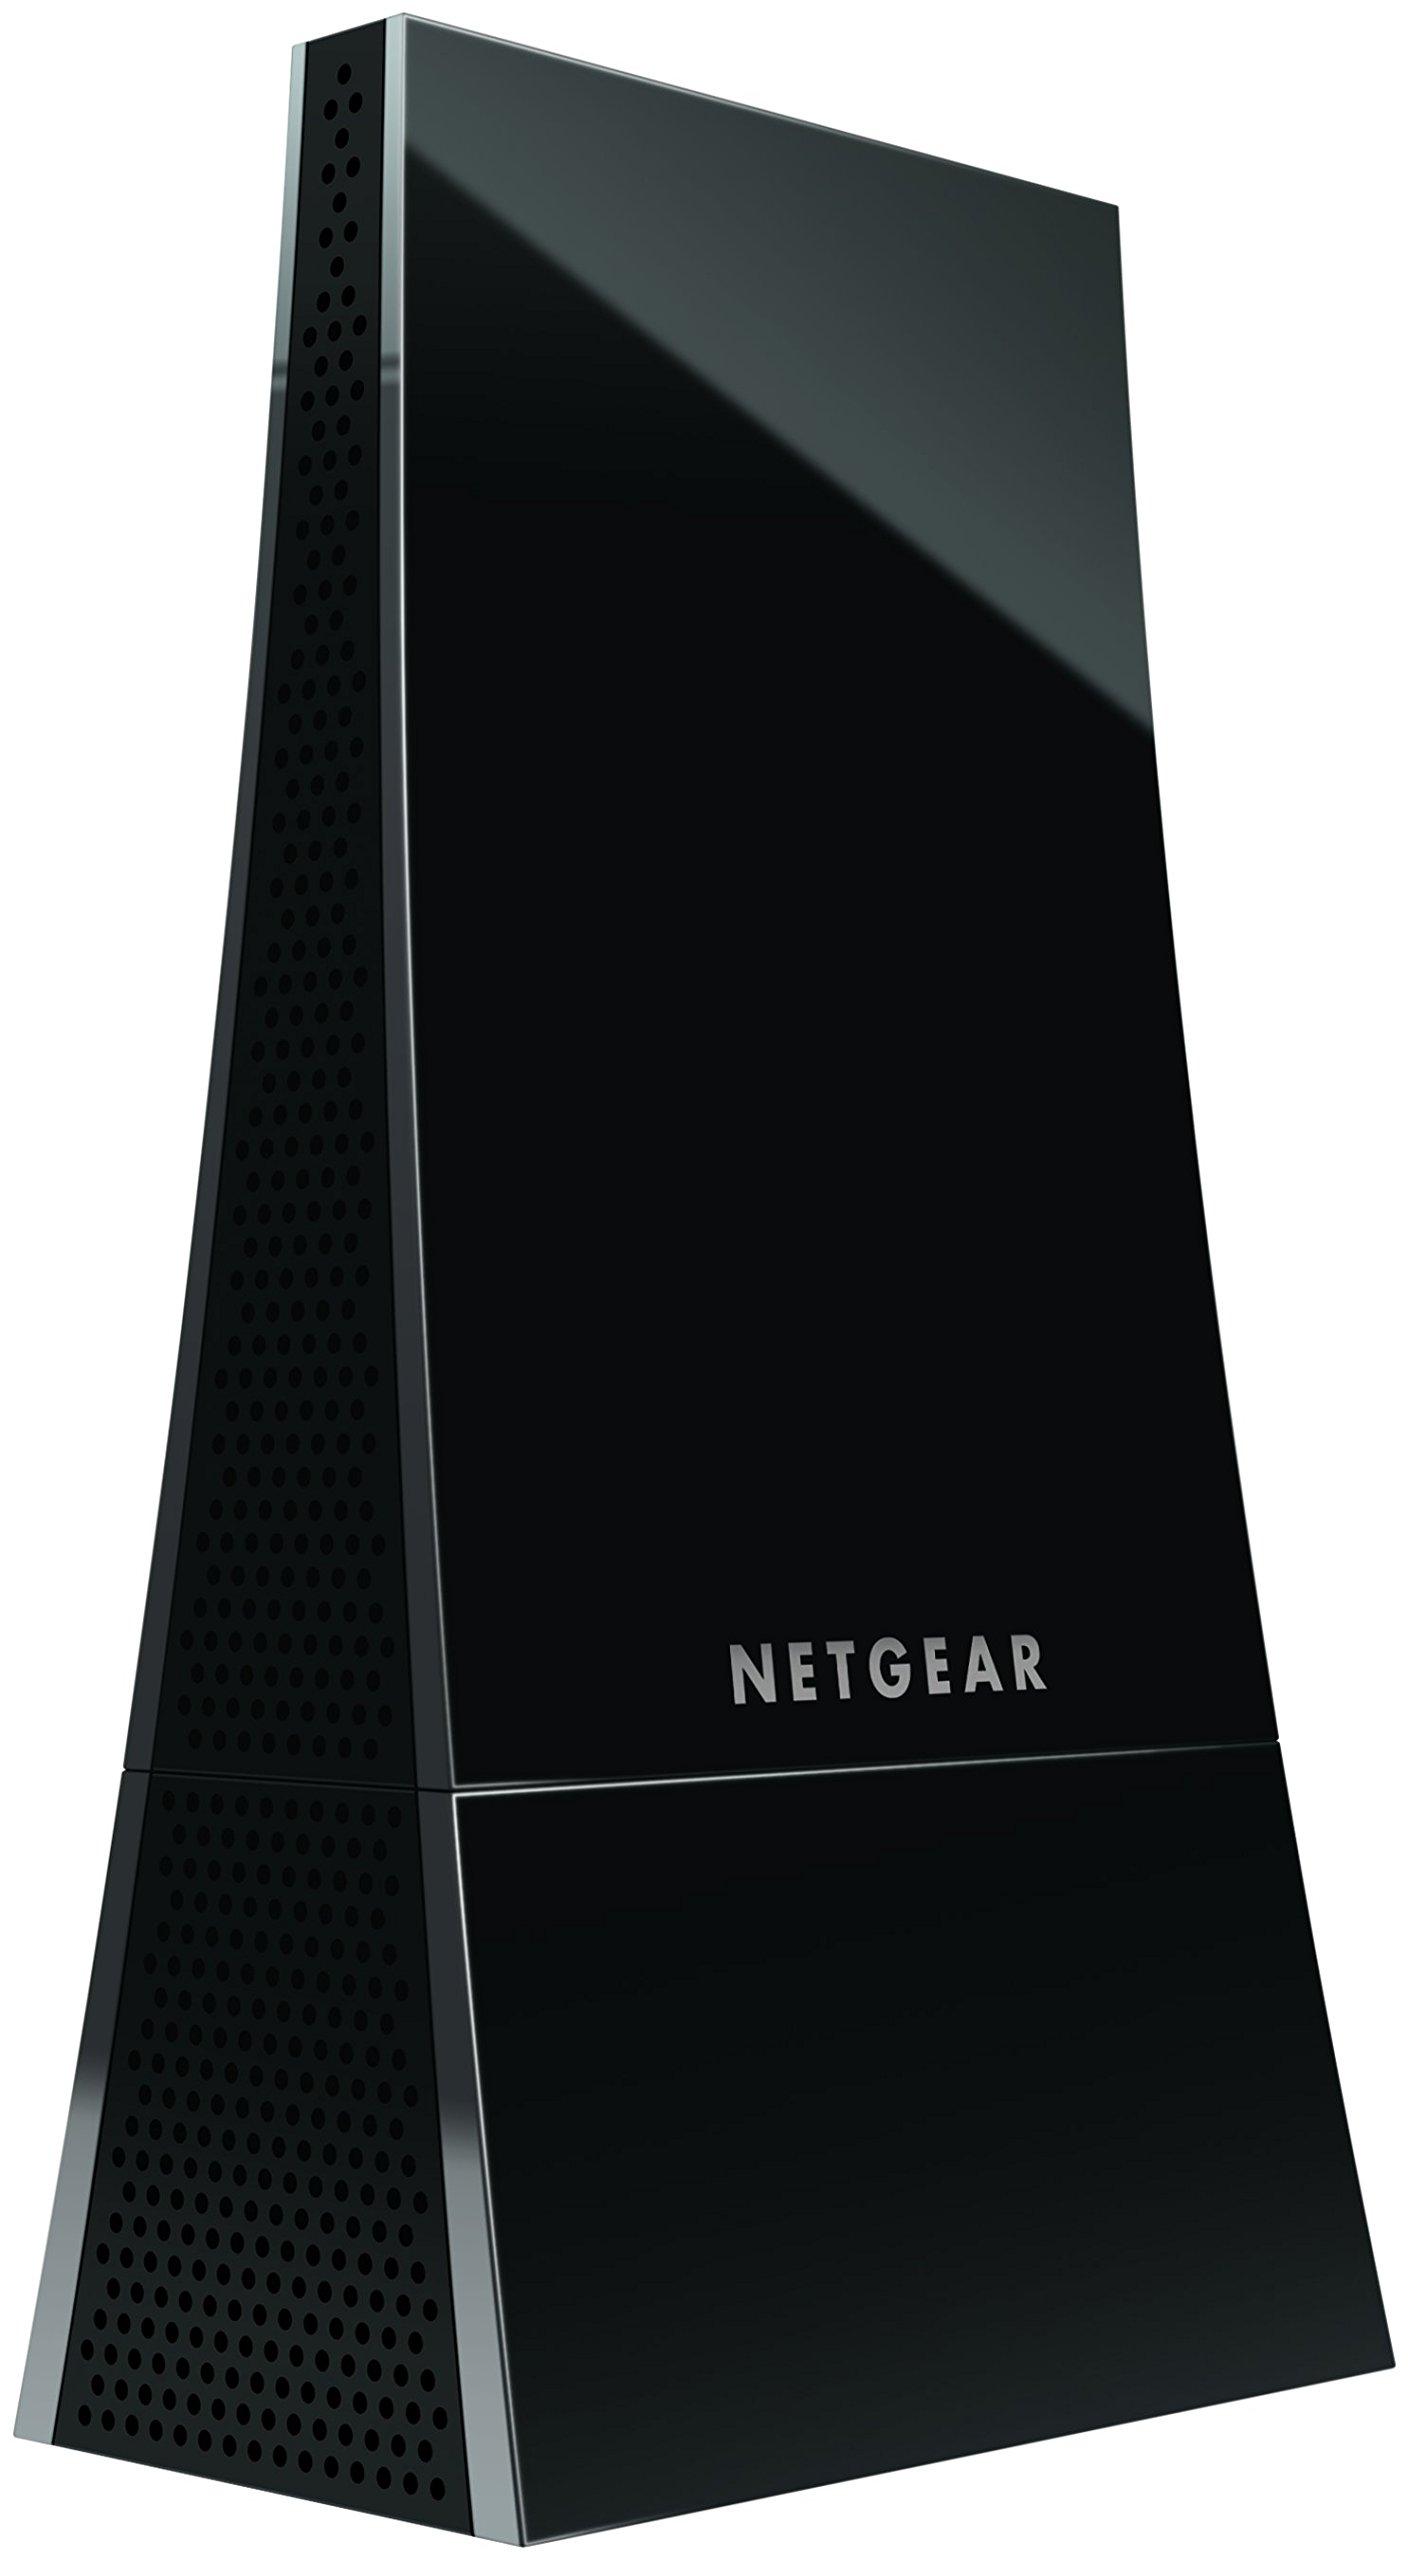 NETGEAR  Universal N600 Dual Band Wi-Fi to Ethernet Adapter (WNCE3001) by NETGEAR